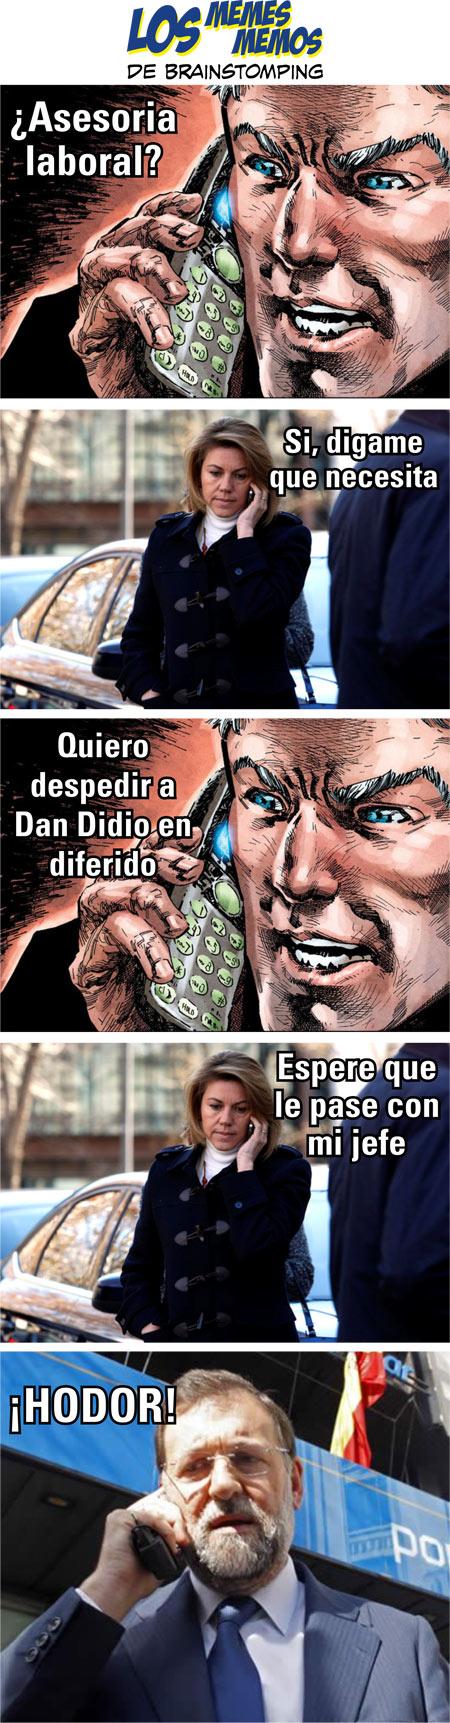 los-memes-memos-de-brainstomping-03